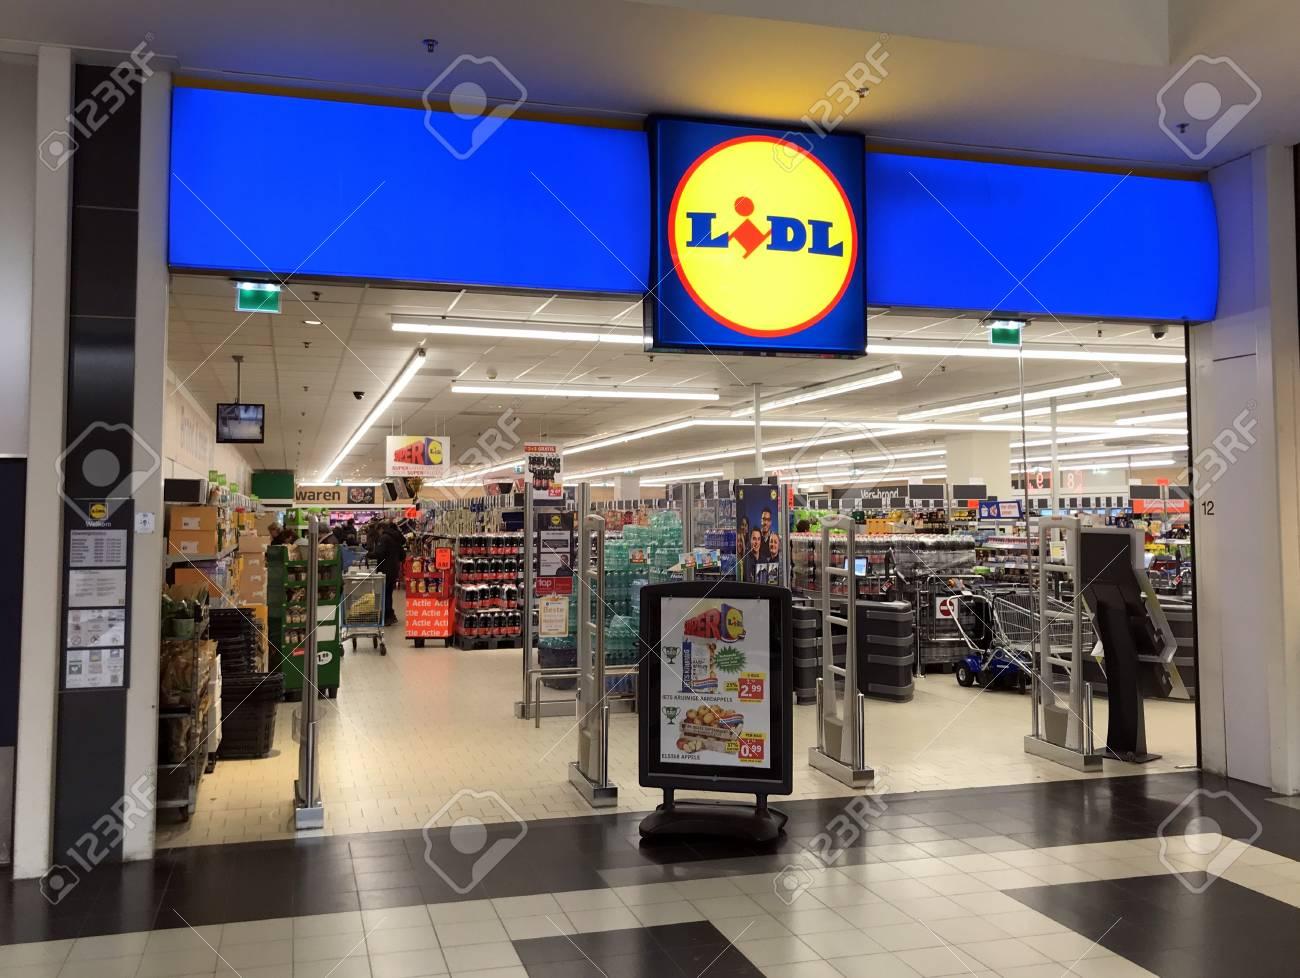 Diemen, the Netherlands - March 8, 2019: Grocery shop entrance